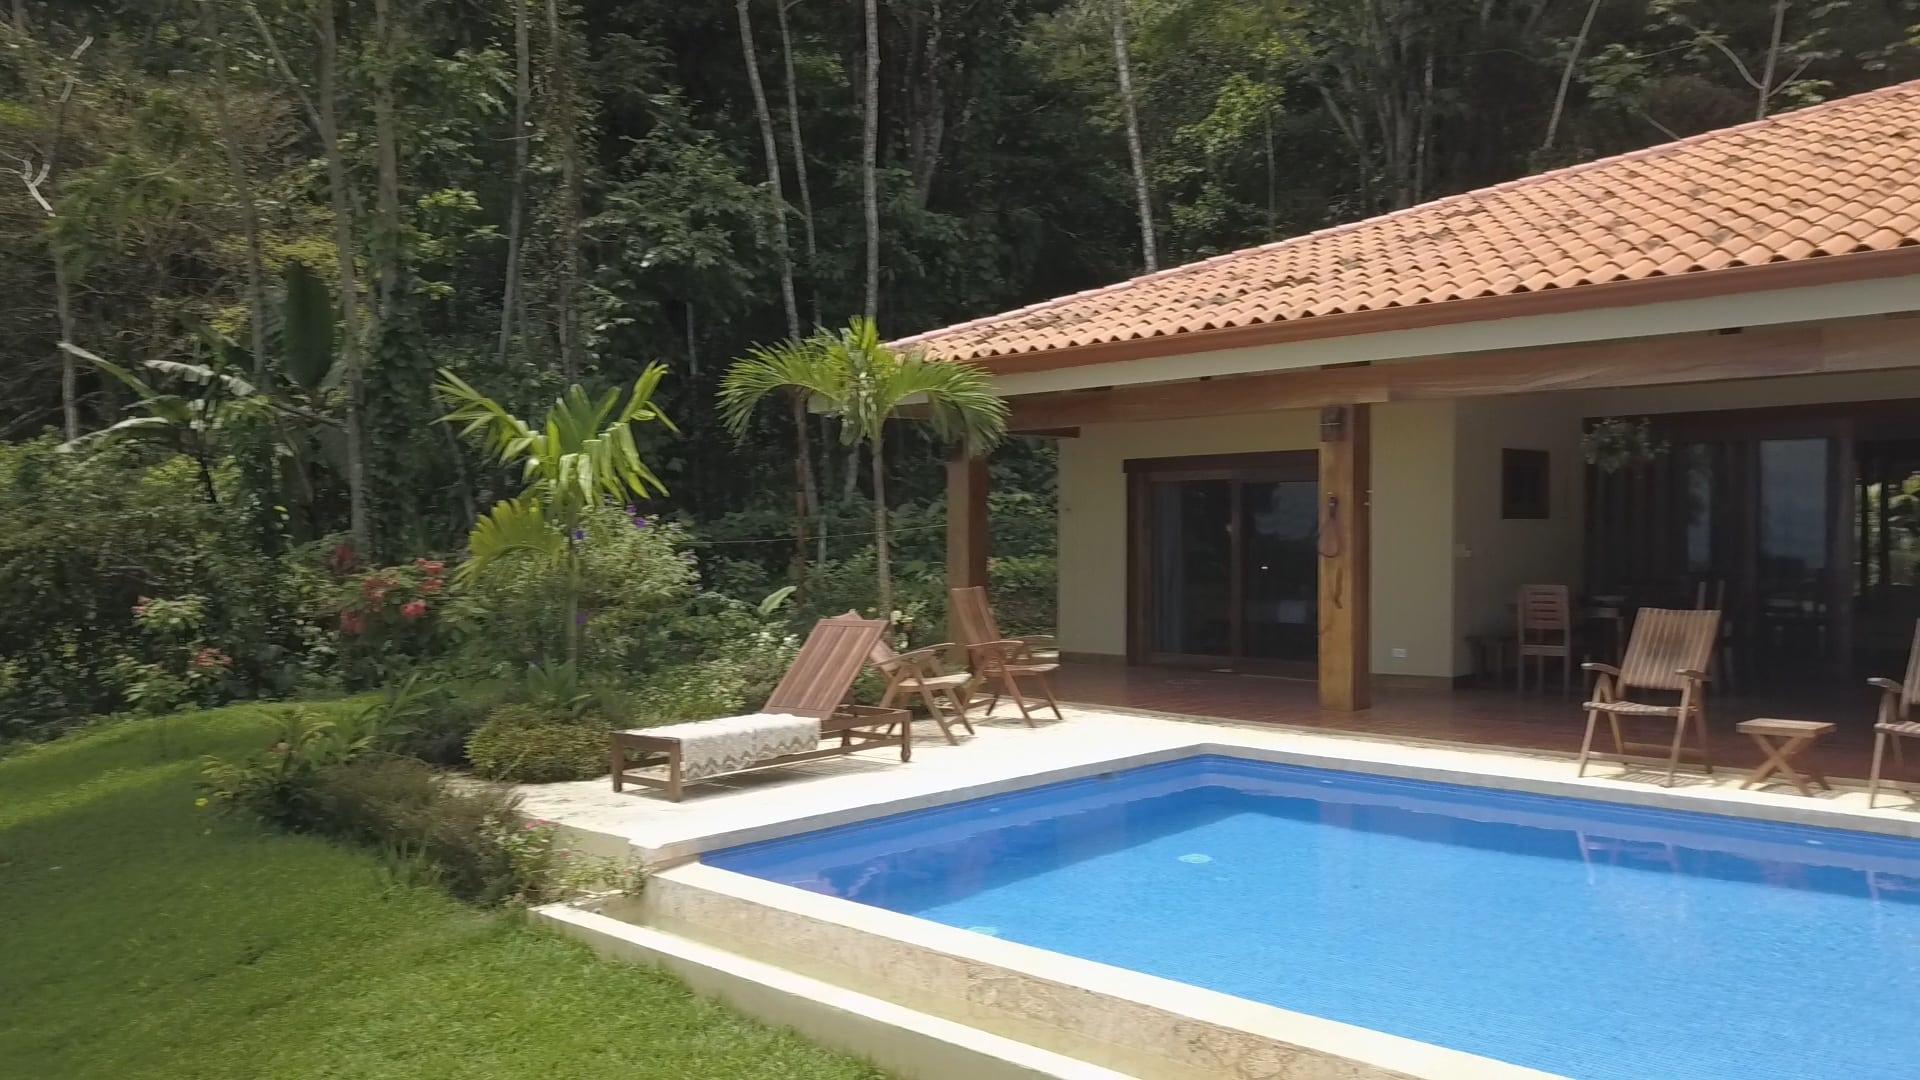 0.83 ACRES - 4 Bedroom Ocean View Home With Pool In Escaleras!!!